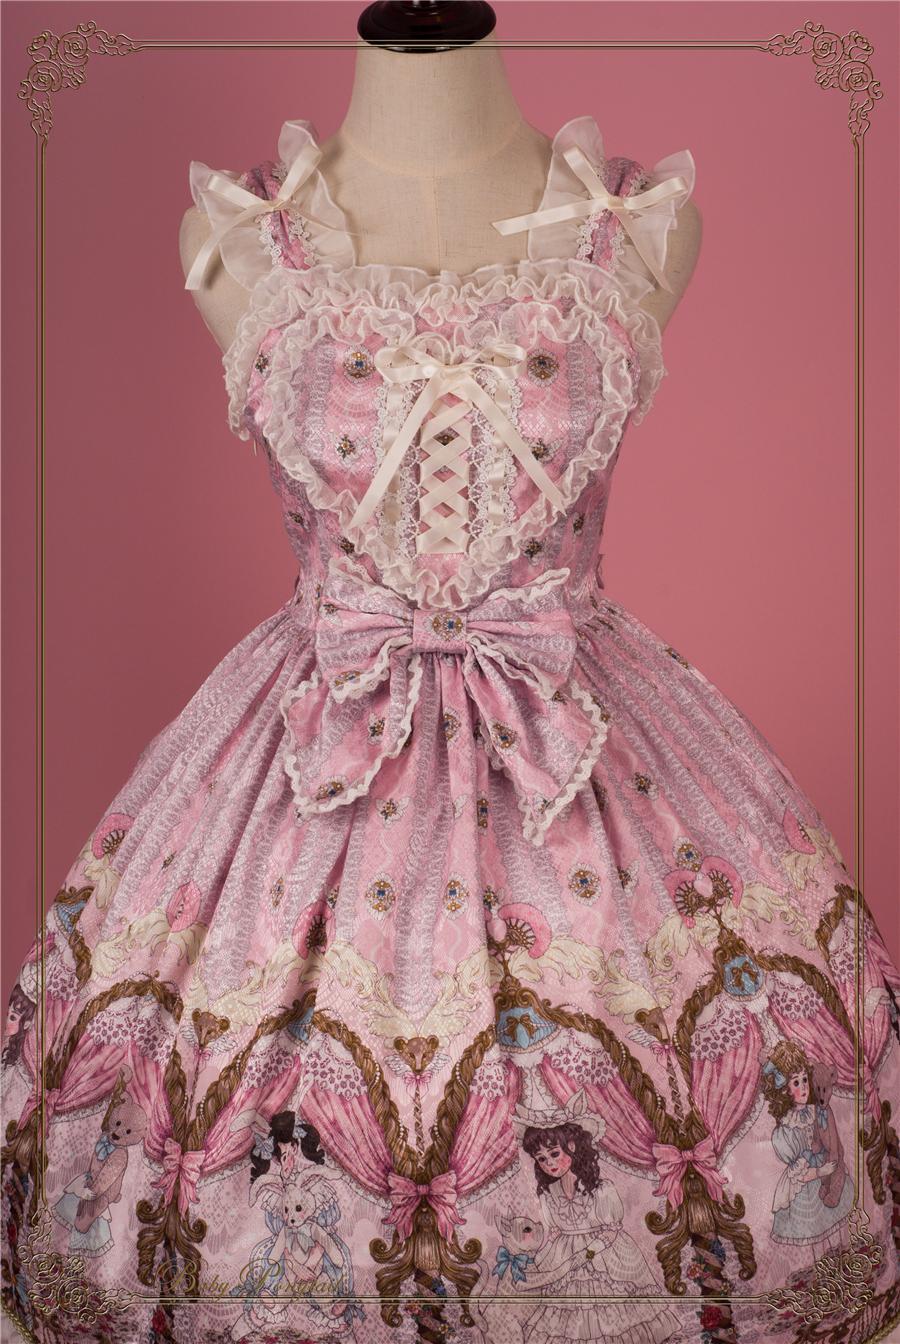 BabyPonytail_Stock Photo_My Favorite Companion_JSK Pink_1.jpg